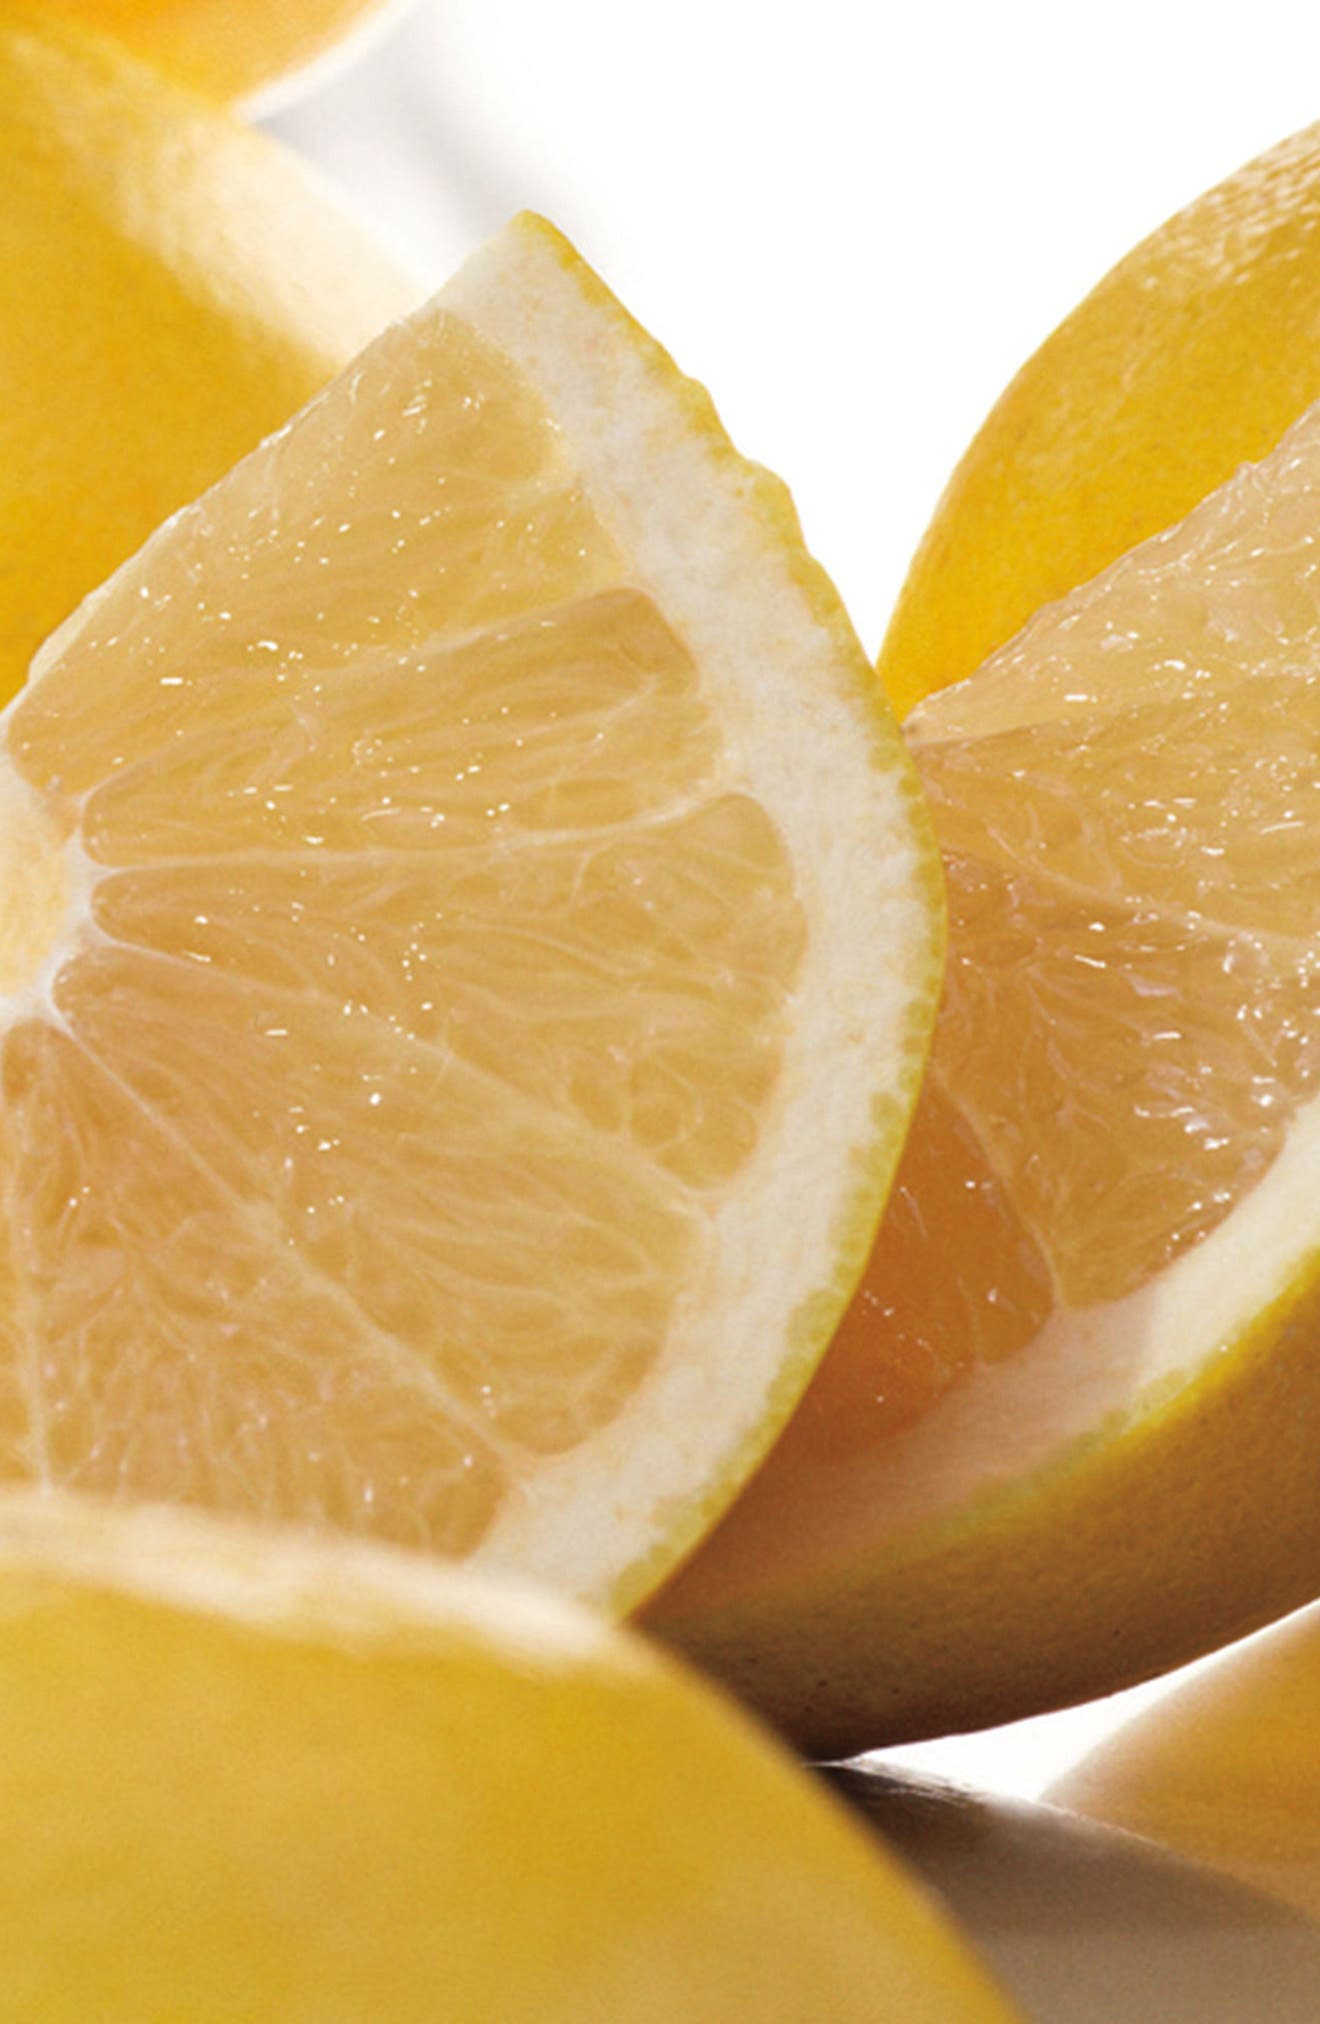 Alternate Image 3  - Jo Malone London™ 'Grapefruit' Cologne (3.4 oz.)